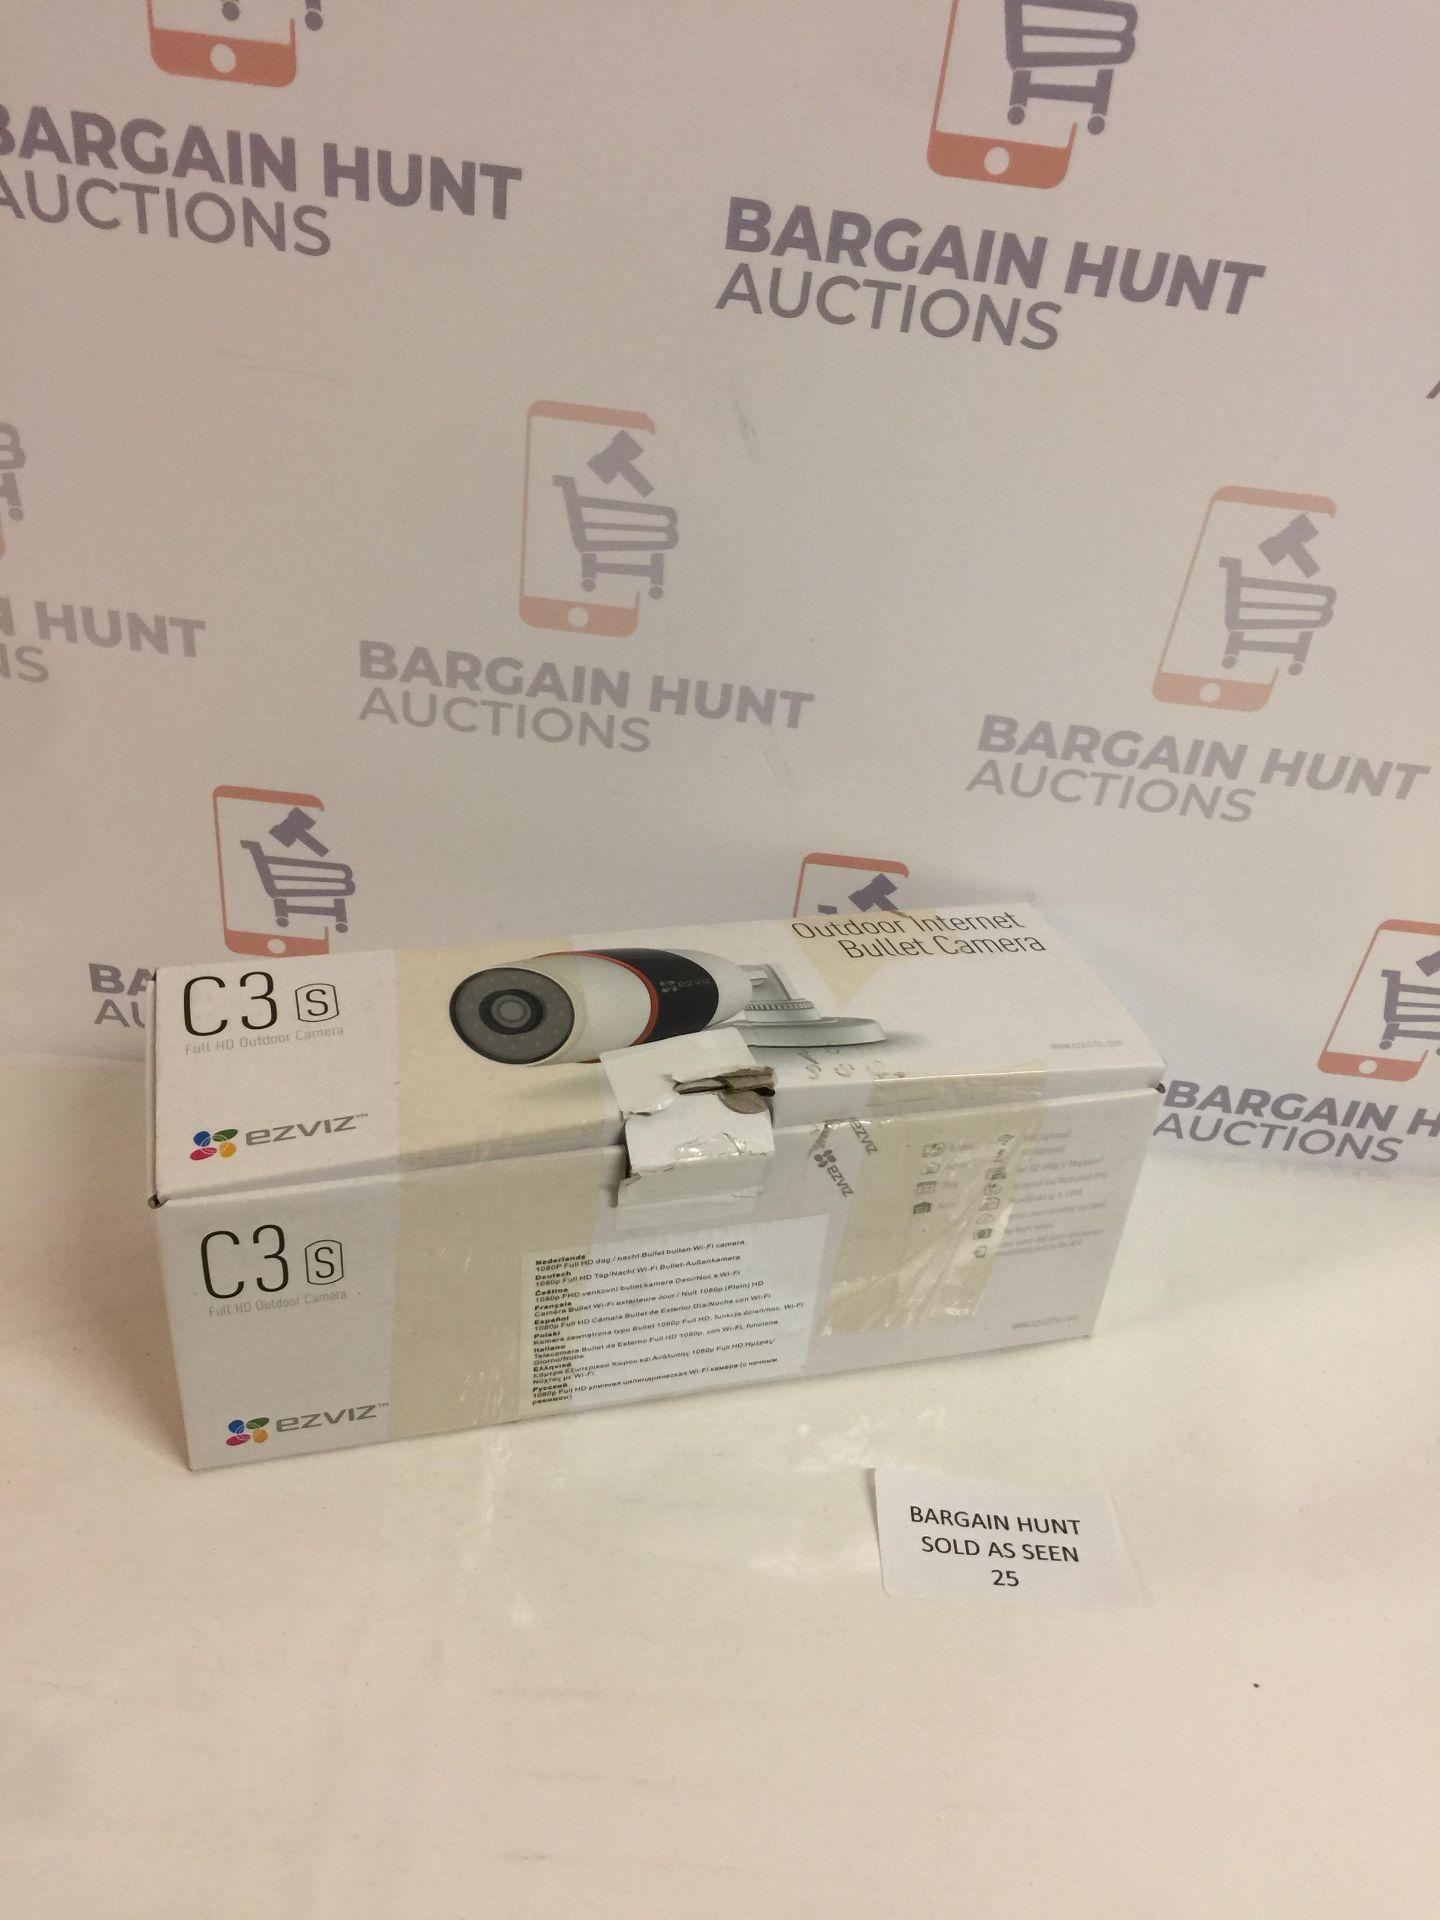 Lot 25 - EZVIZ C3S WiFi Smart Home Security Camera, 1080P Outdoor Security IP Camera